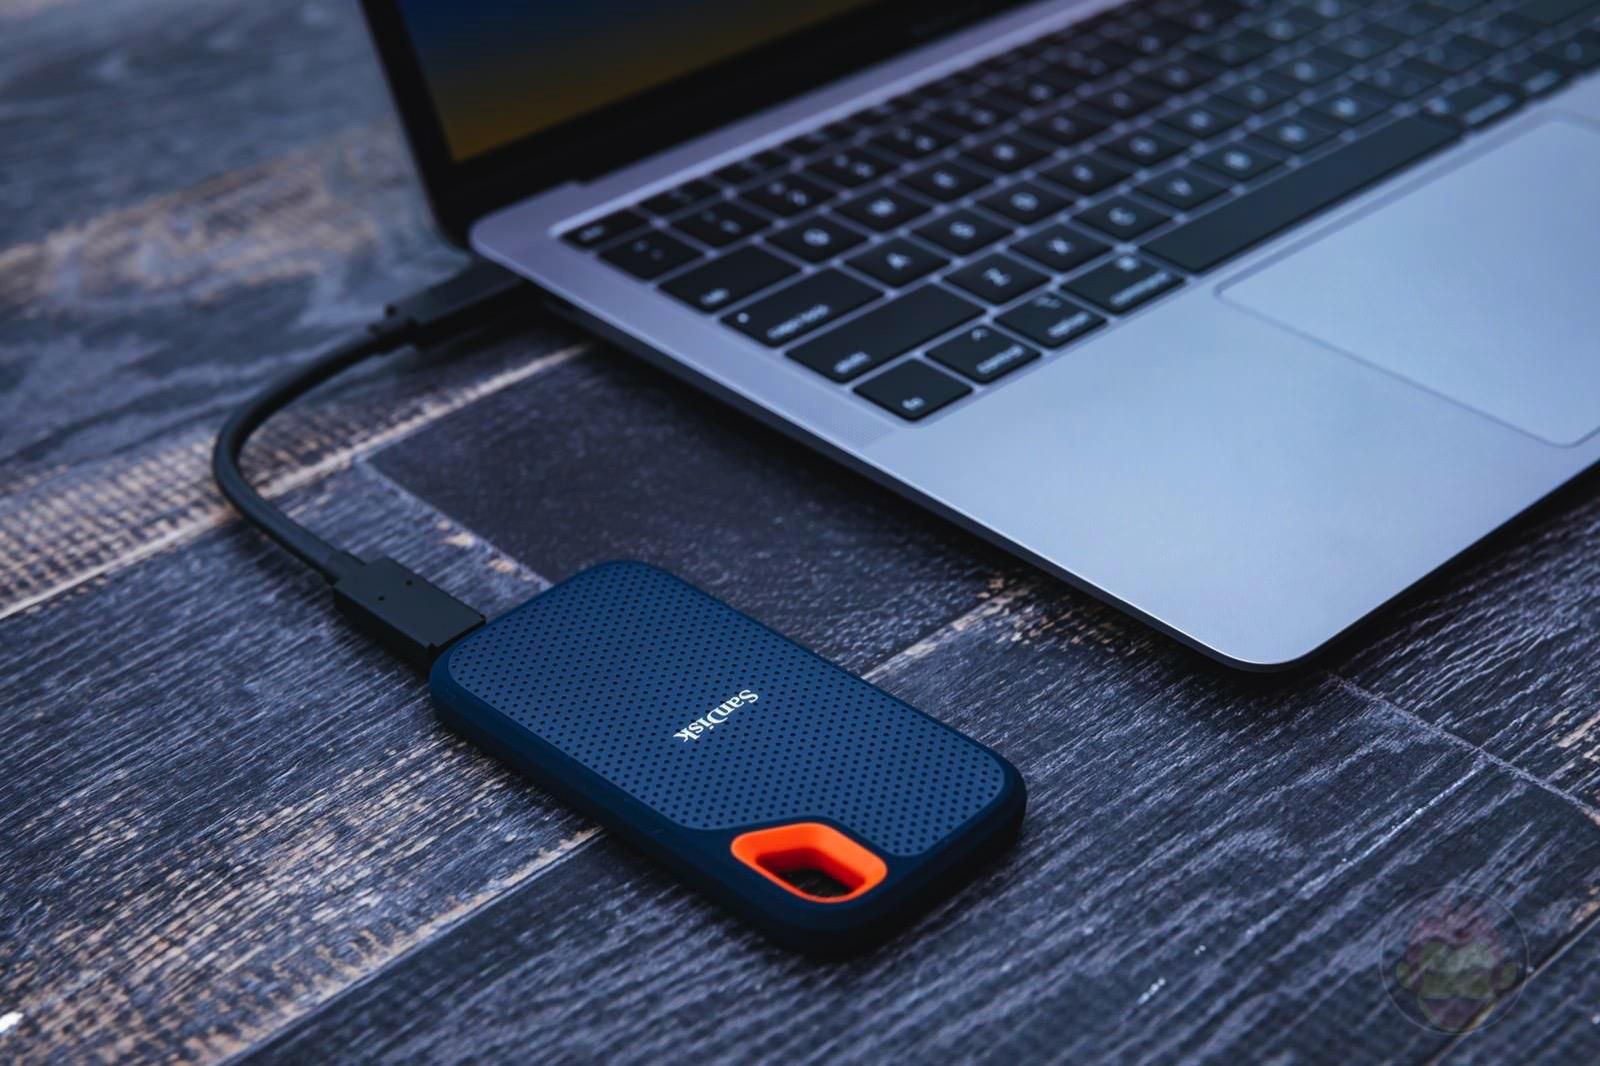 Sandisk-Extreme-Portable-1TB-SSD-08.jpg